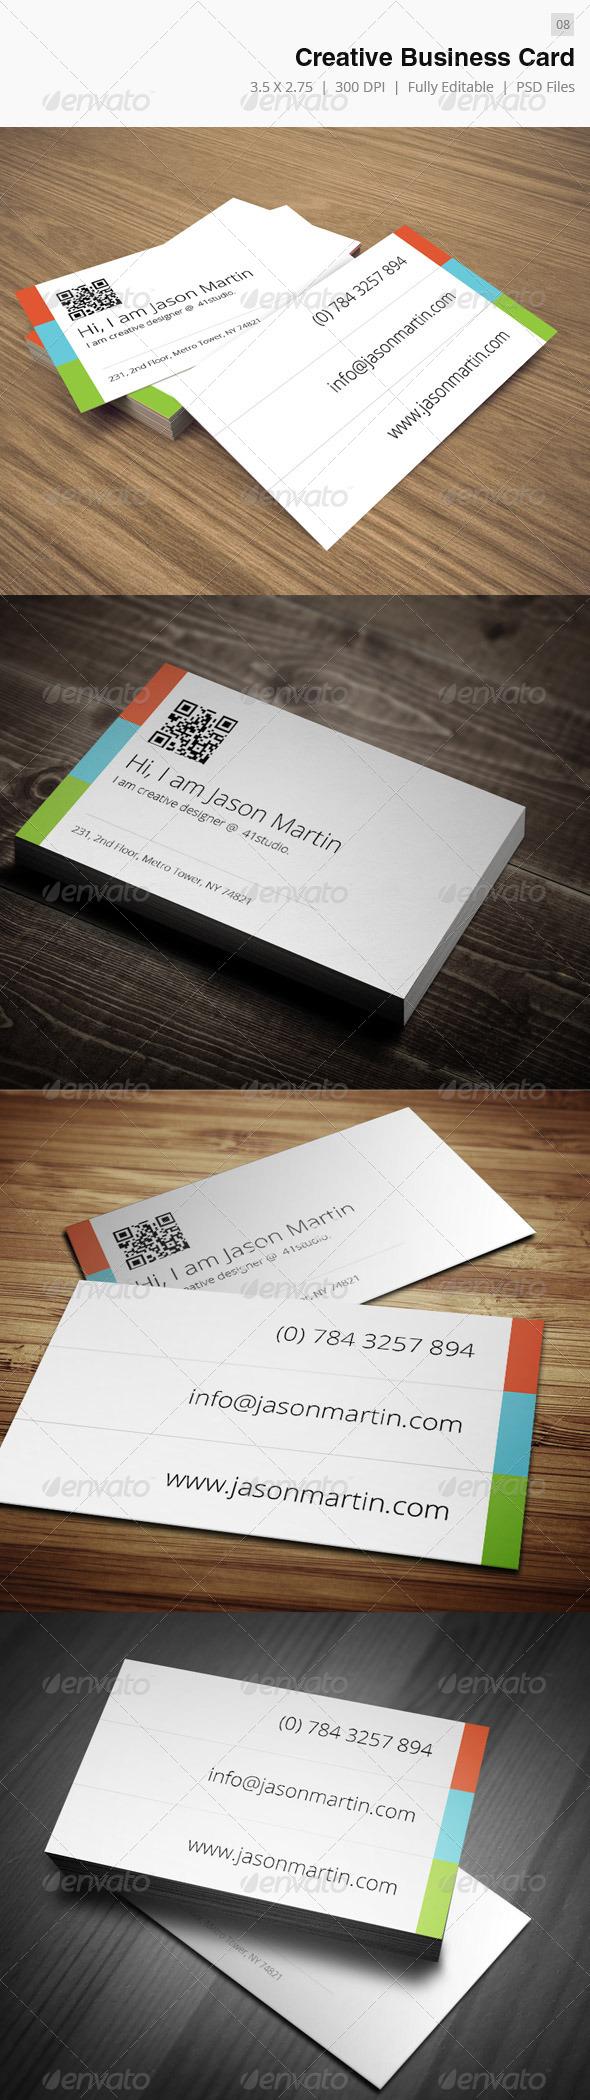 Simple Creative Business Card - 08 - Creative Business Cards